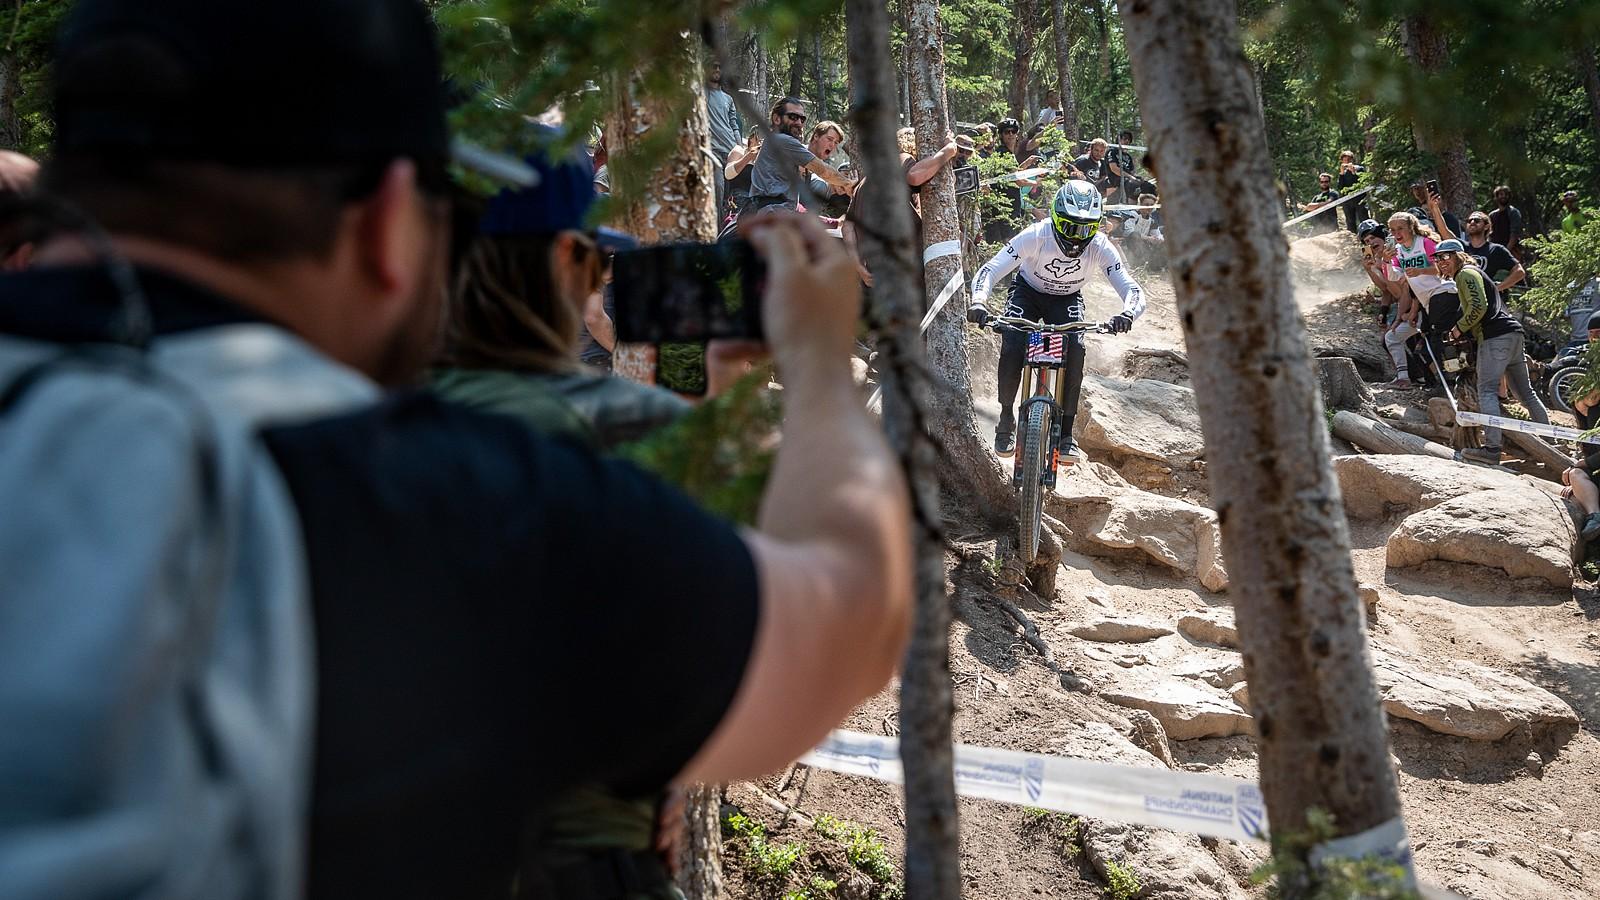 Neko Mulally - US National Champs Downhill Photo Blast - Mountain Biking Pictures - Vital MTB